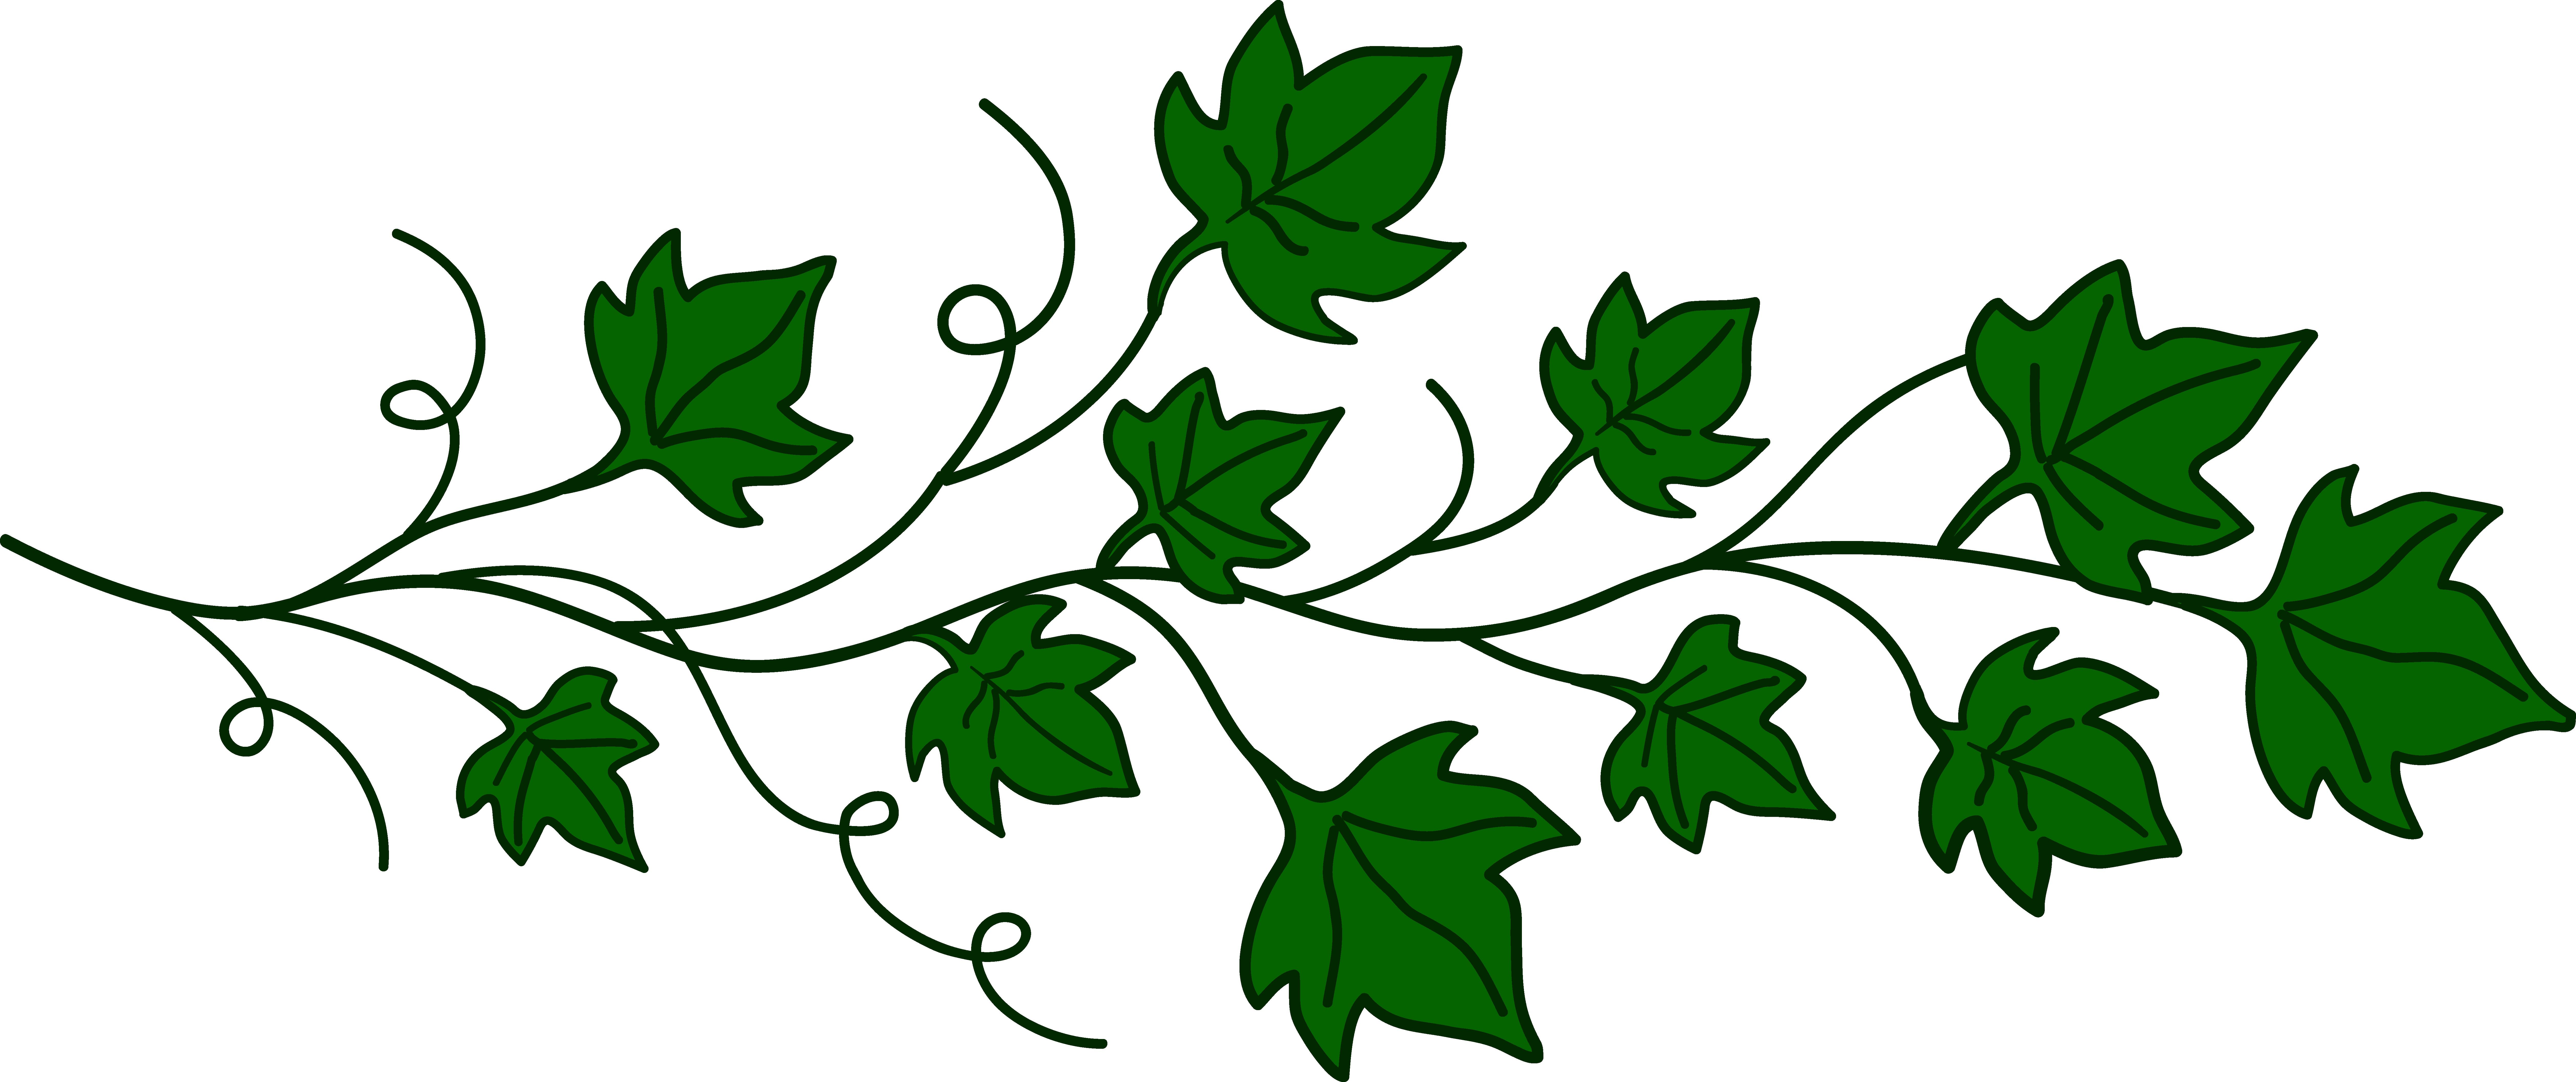 Clipart pumpkin vine, Clipart pumpkin vine Transparent FREE.